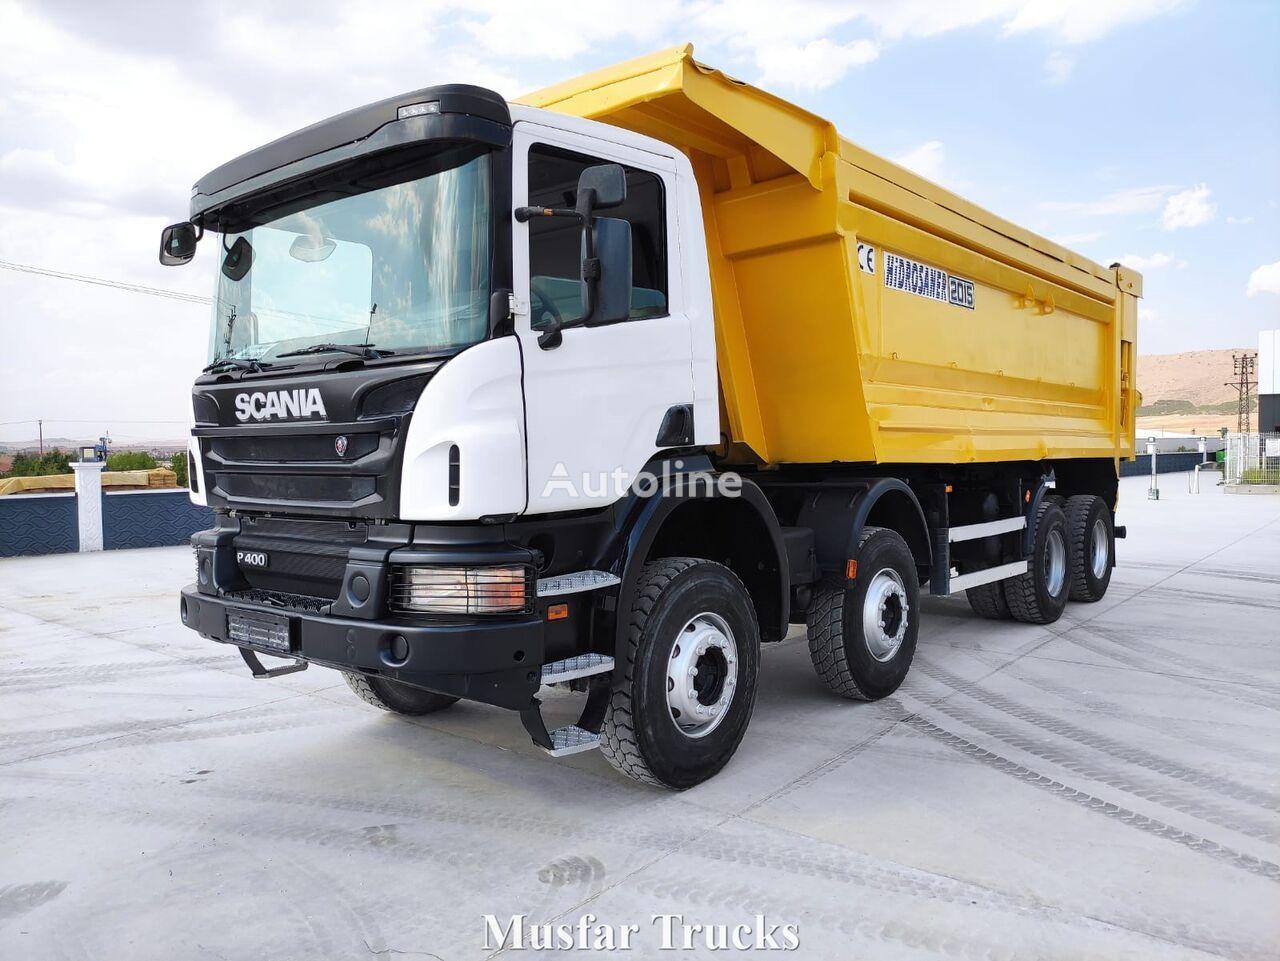 SCANIA 2015 Model - P400 dump truck